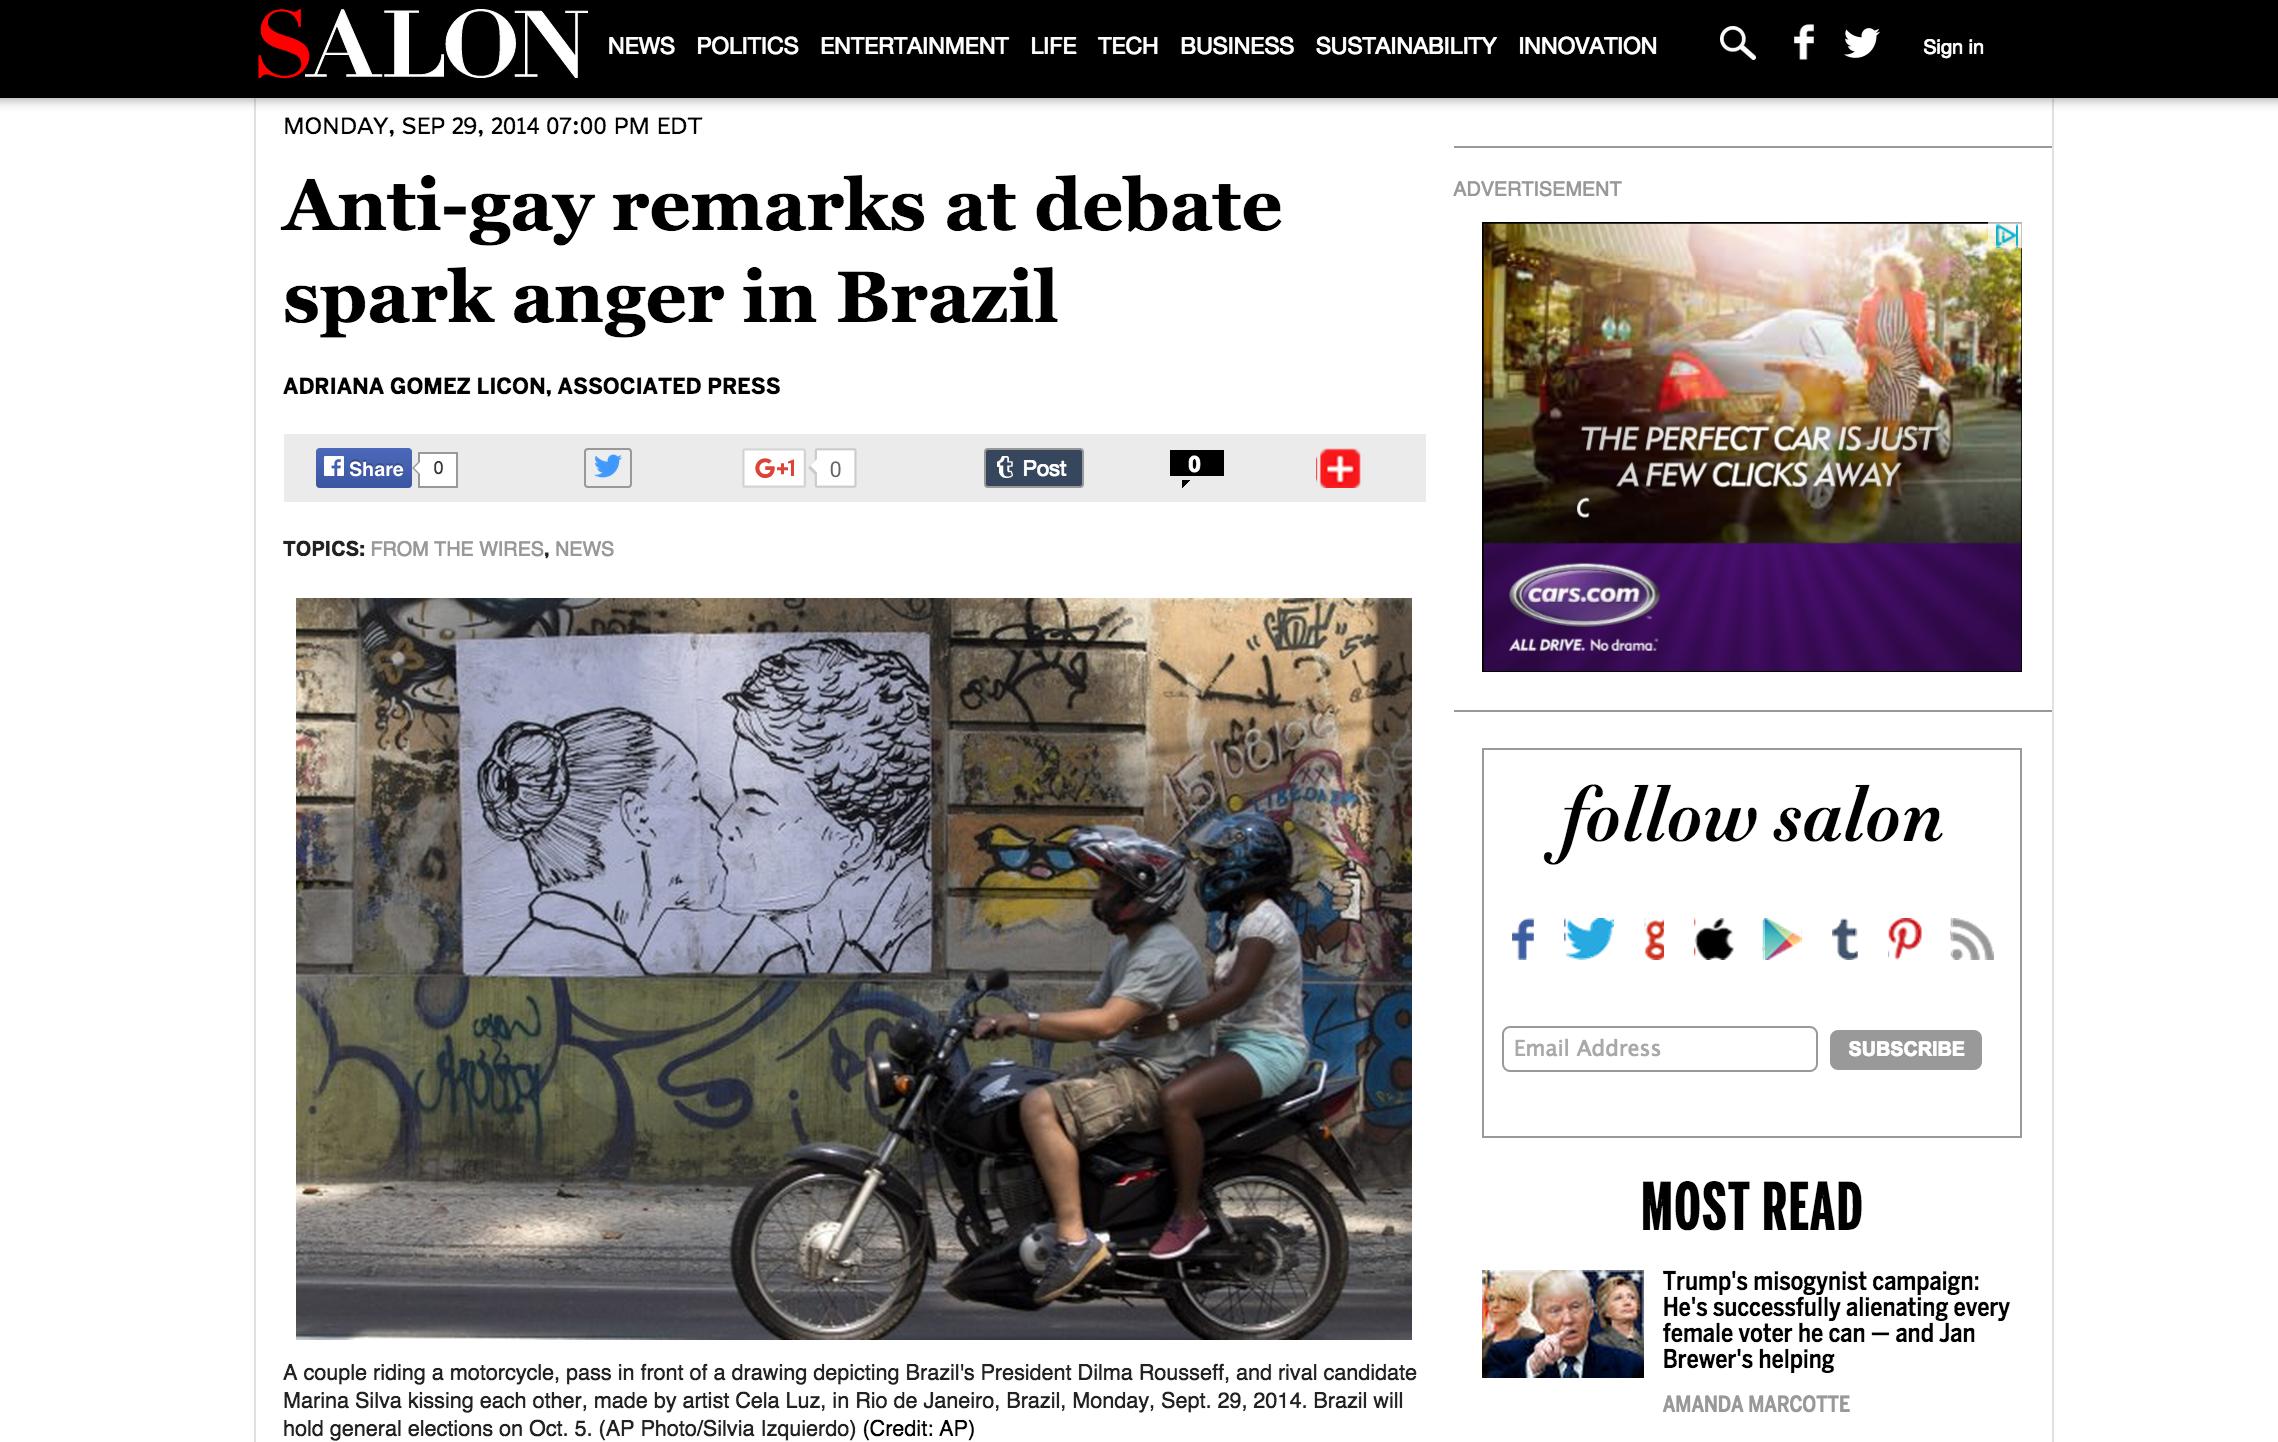 http://www.salon.com/2014/09/29/anti_gay_remarks_at_debate_spark_anger_in_brazil/